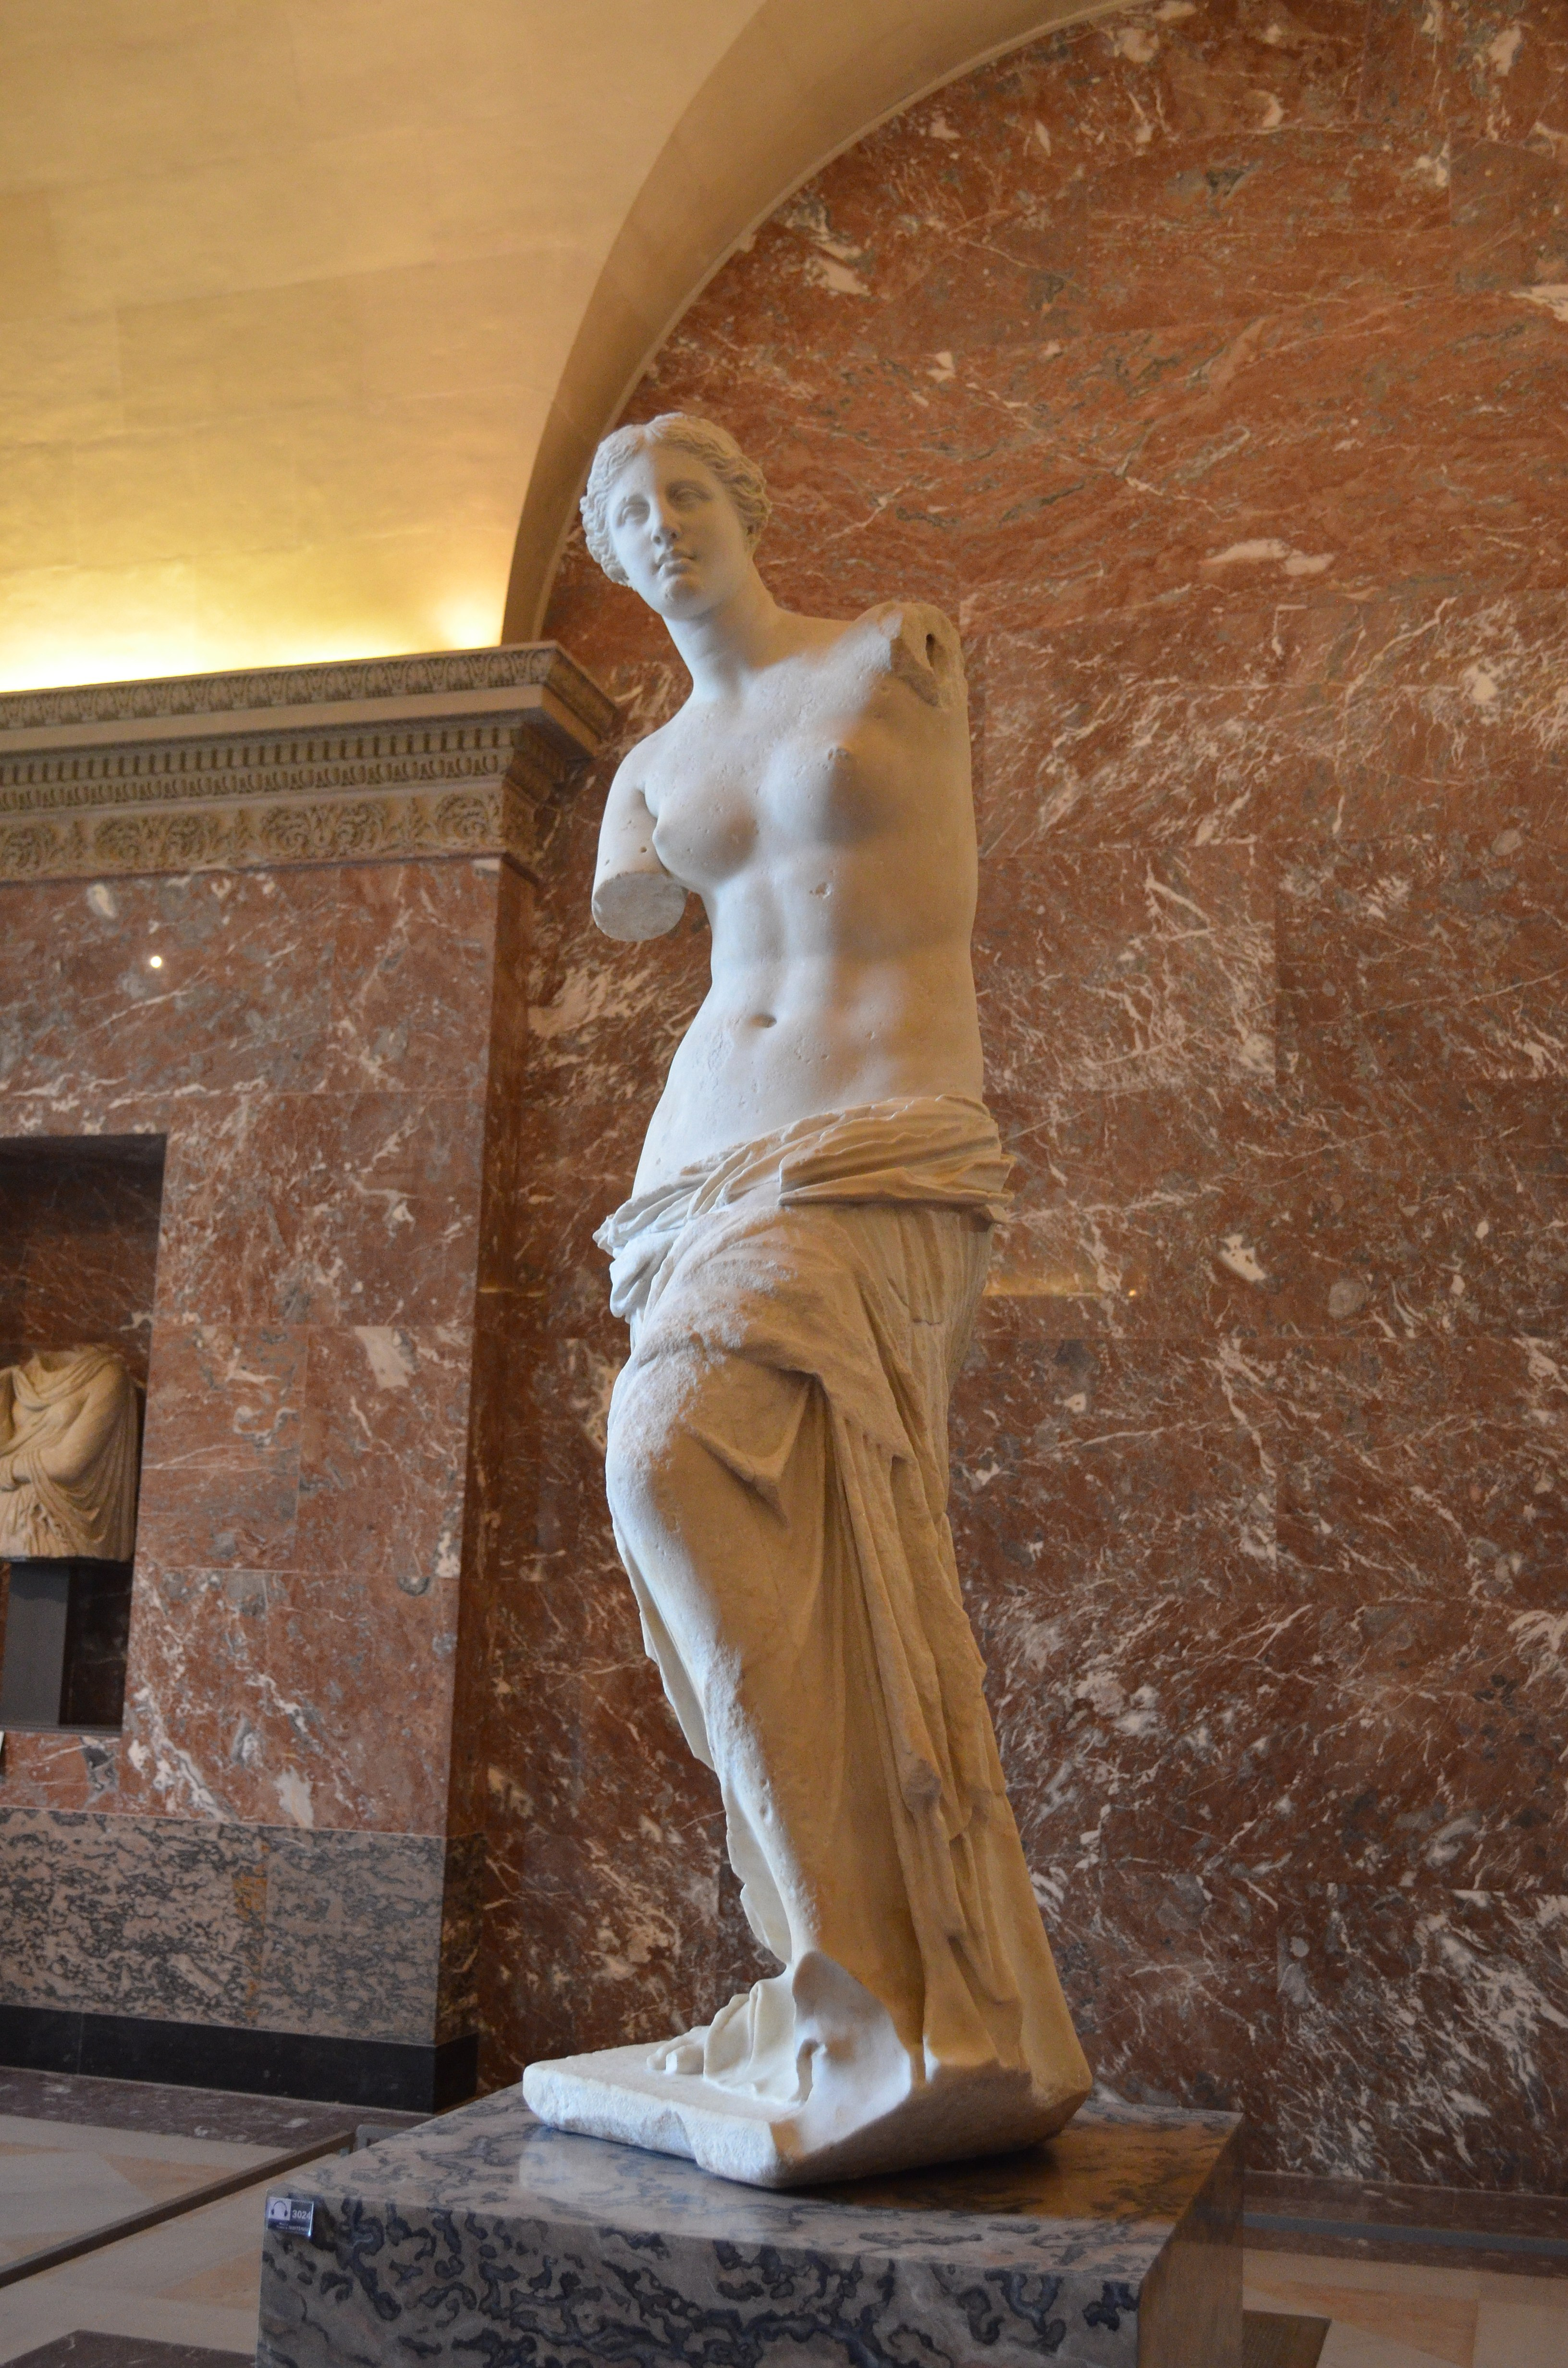 Венера Милосская. Около 130–100 гг. до н.э. Мрамор. Высота 2,02 м. Лувр, Париж, Франция. Источник https://upload.wikimedia.org/